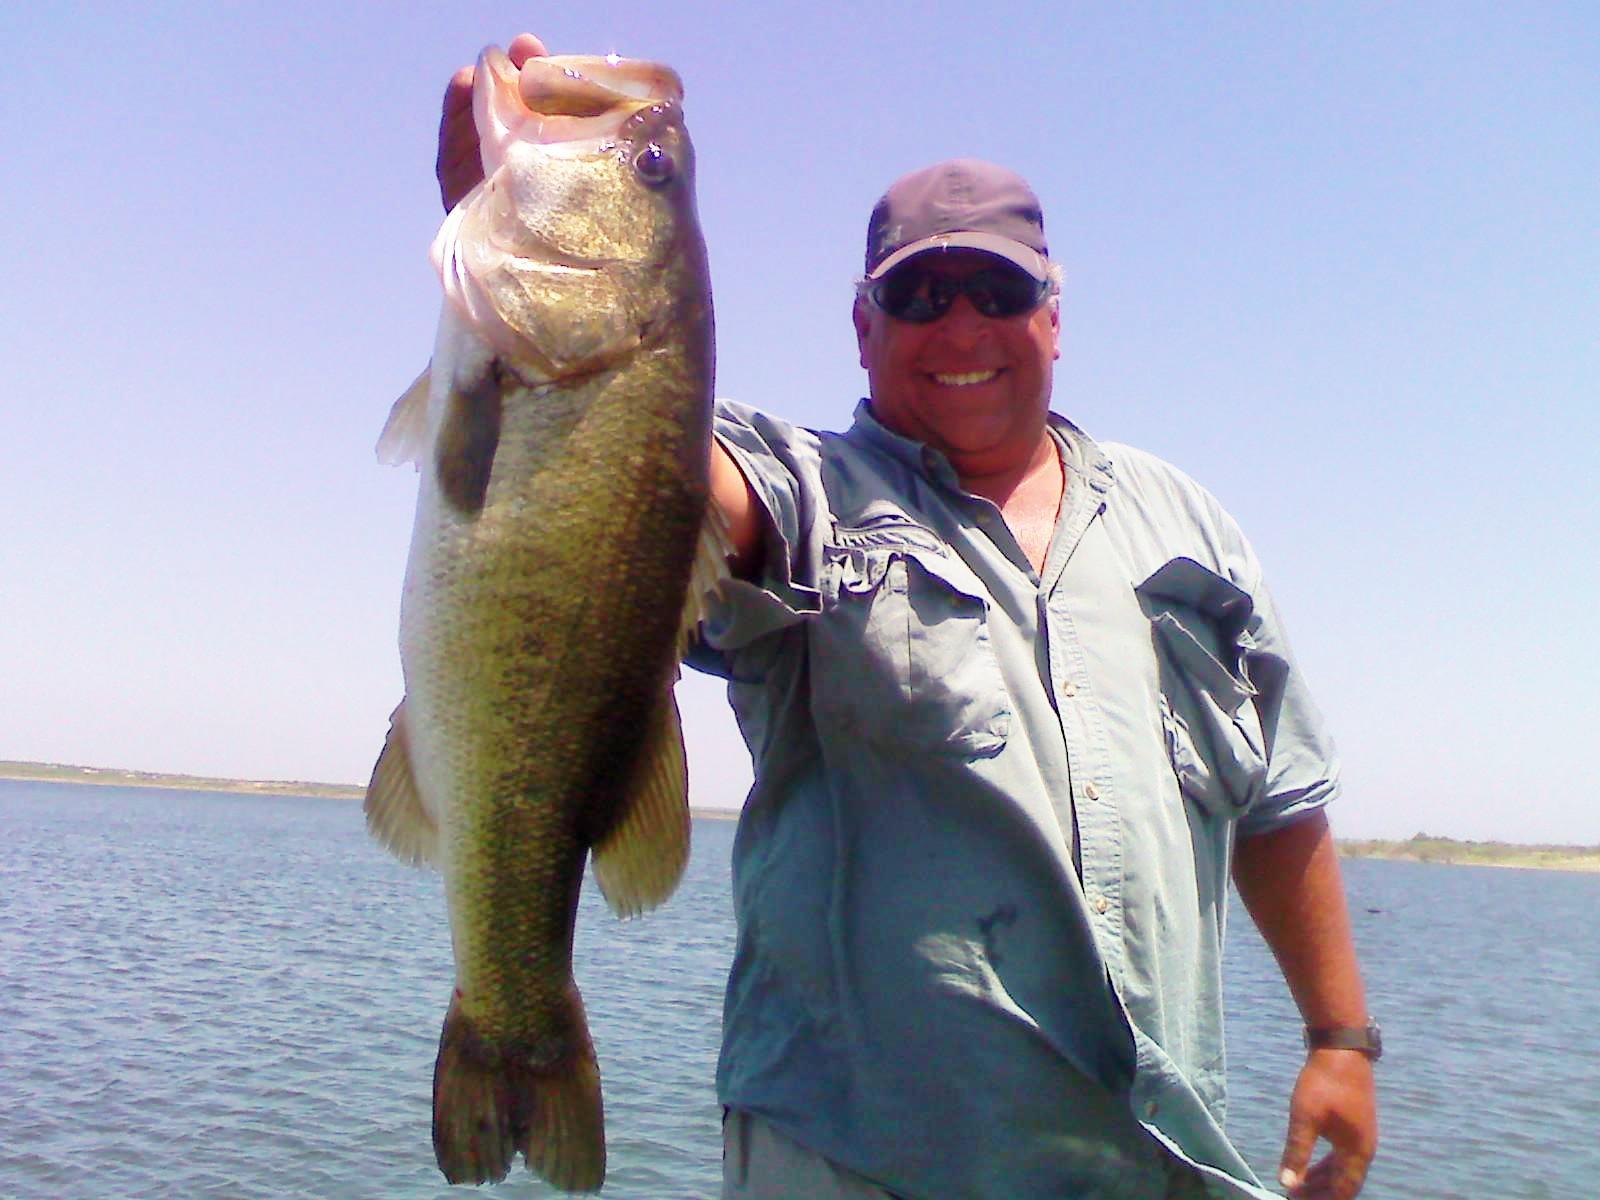 Mike folkestad bass fishing blog bass fishing for Bass fishing texas